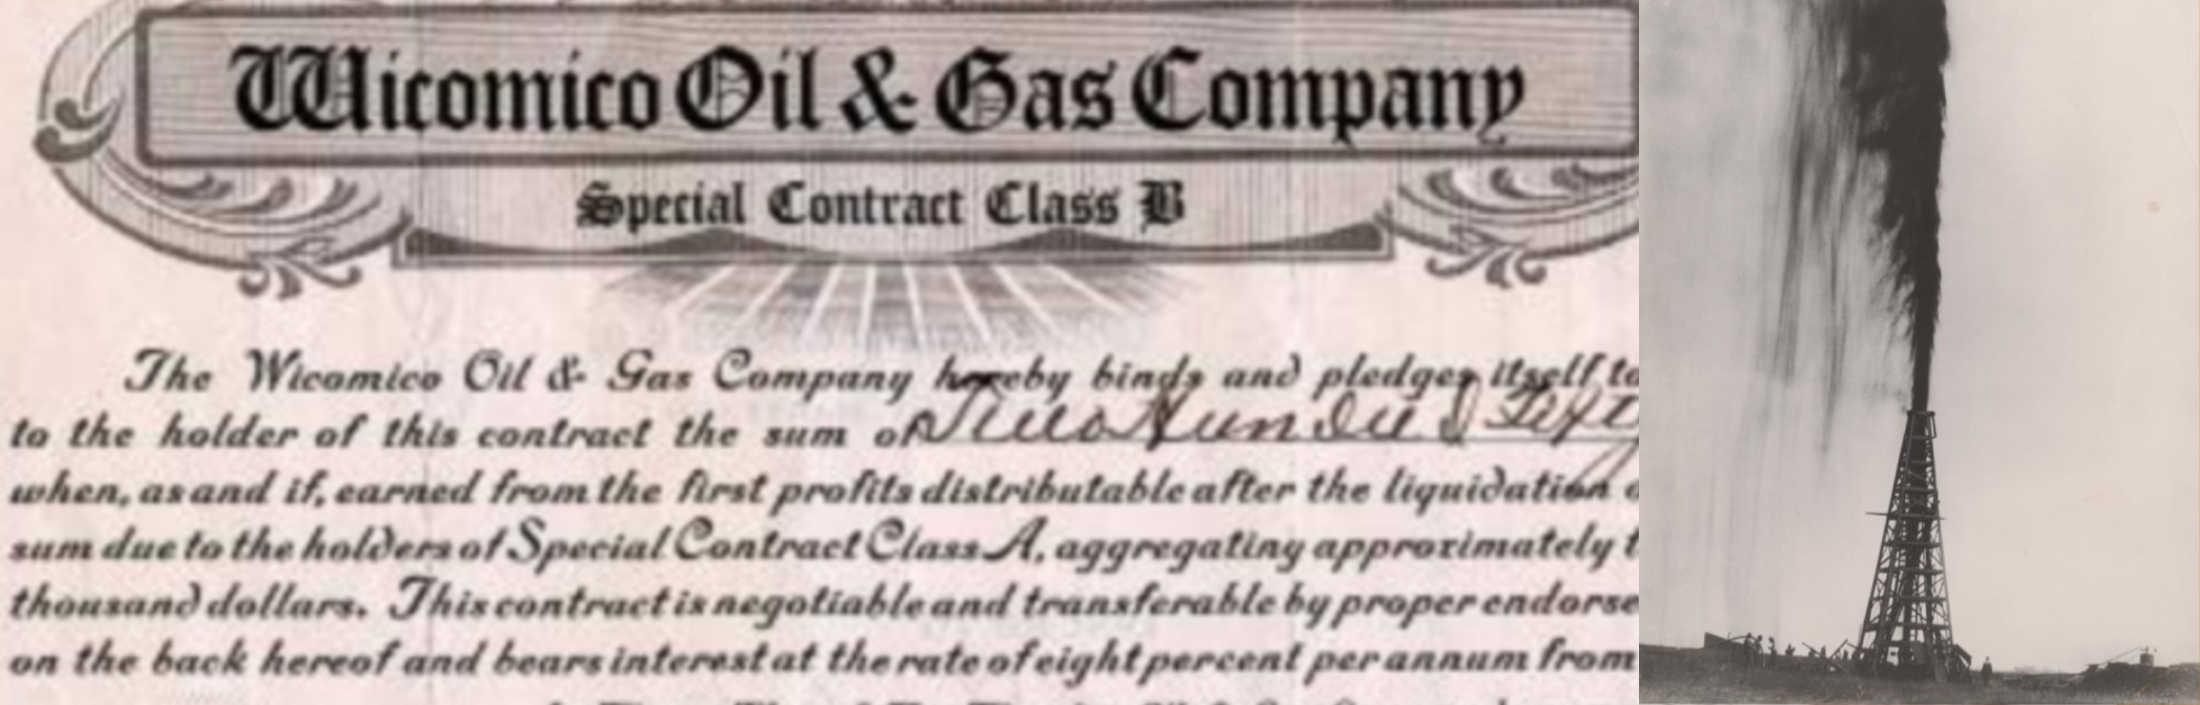 BLACK GOLD IN PARSONSBURG! The Delmarva Oil Craze of the Early 1900s